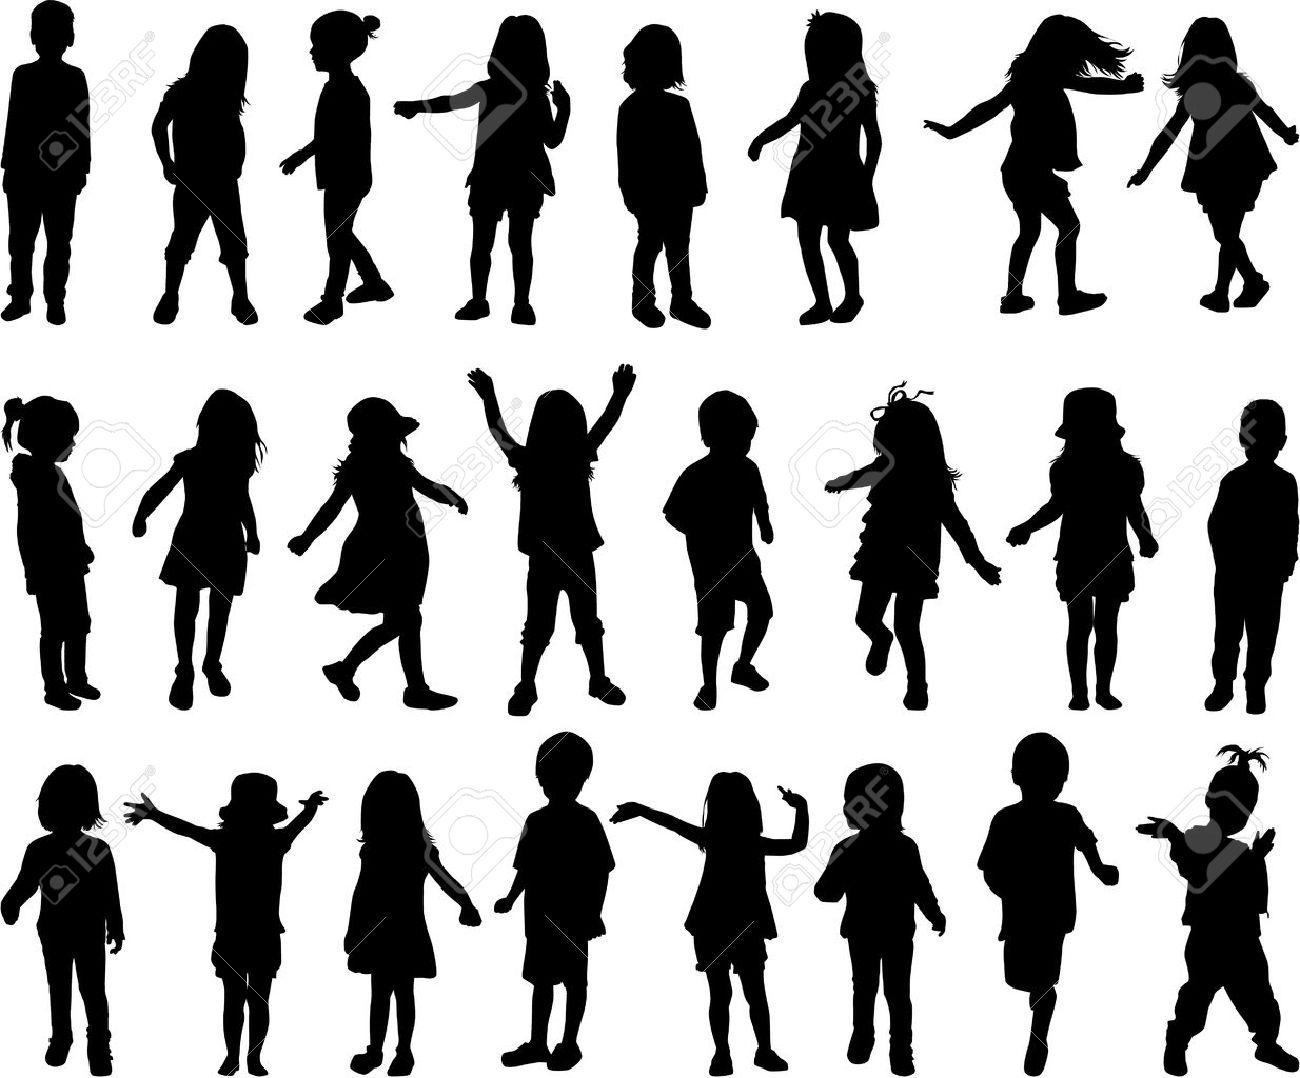 children silhouettes - 36467463